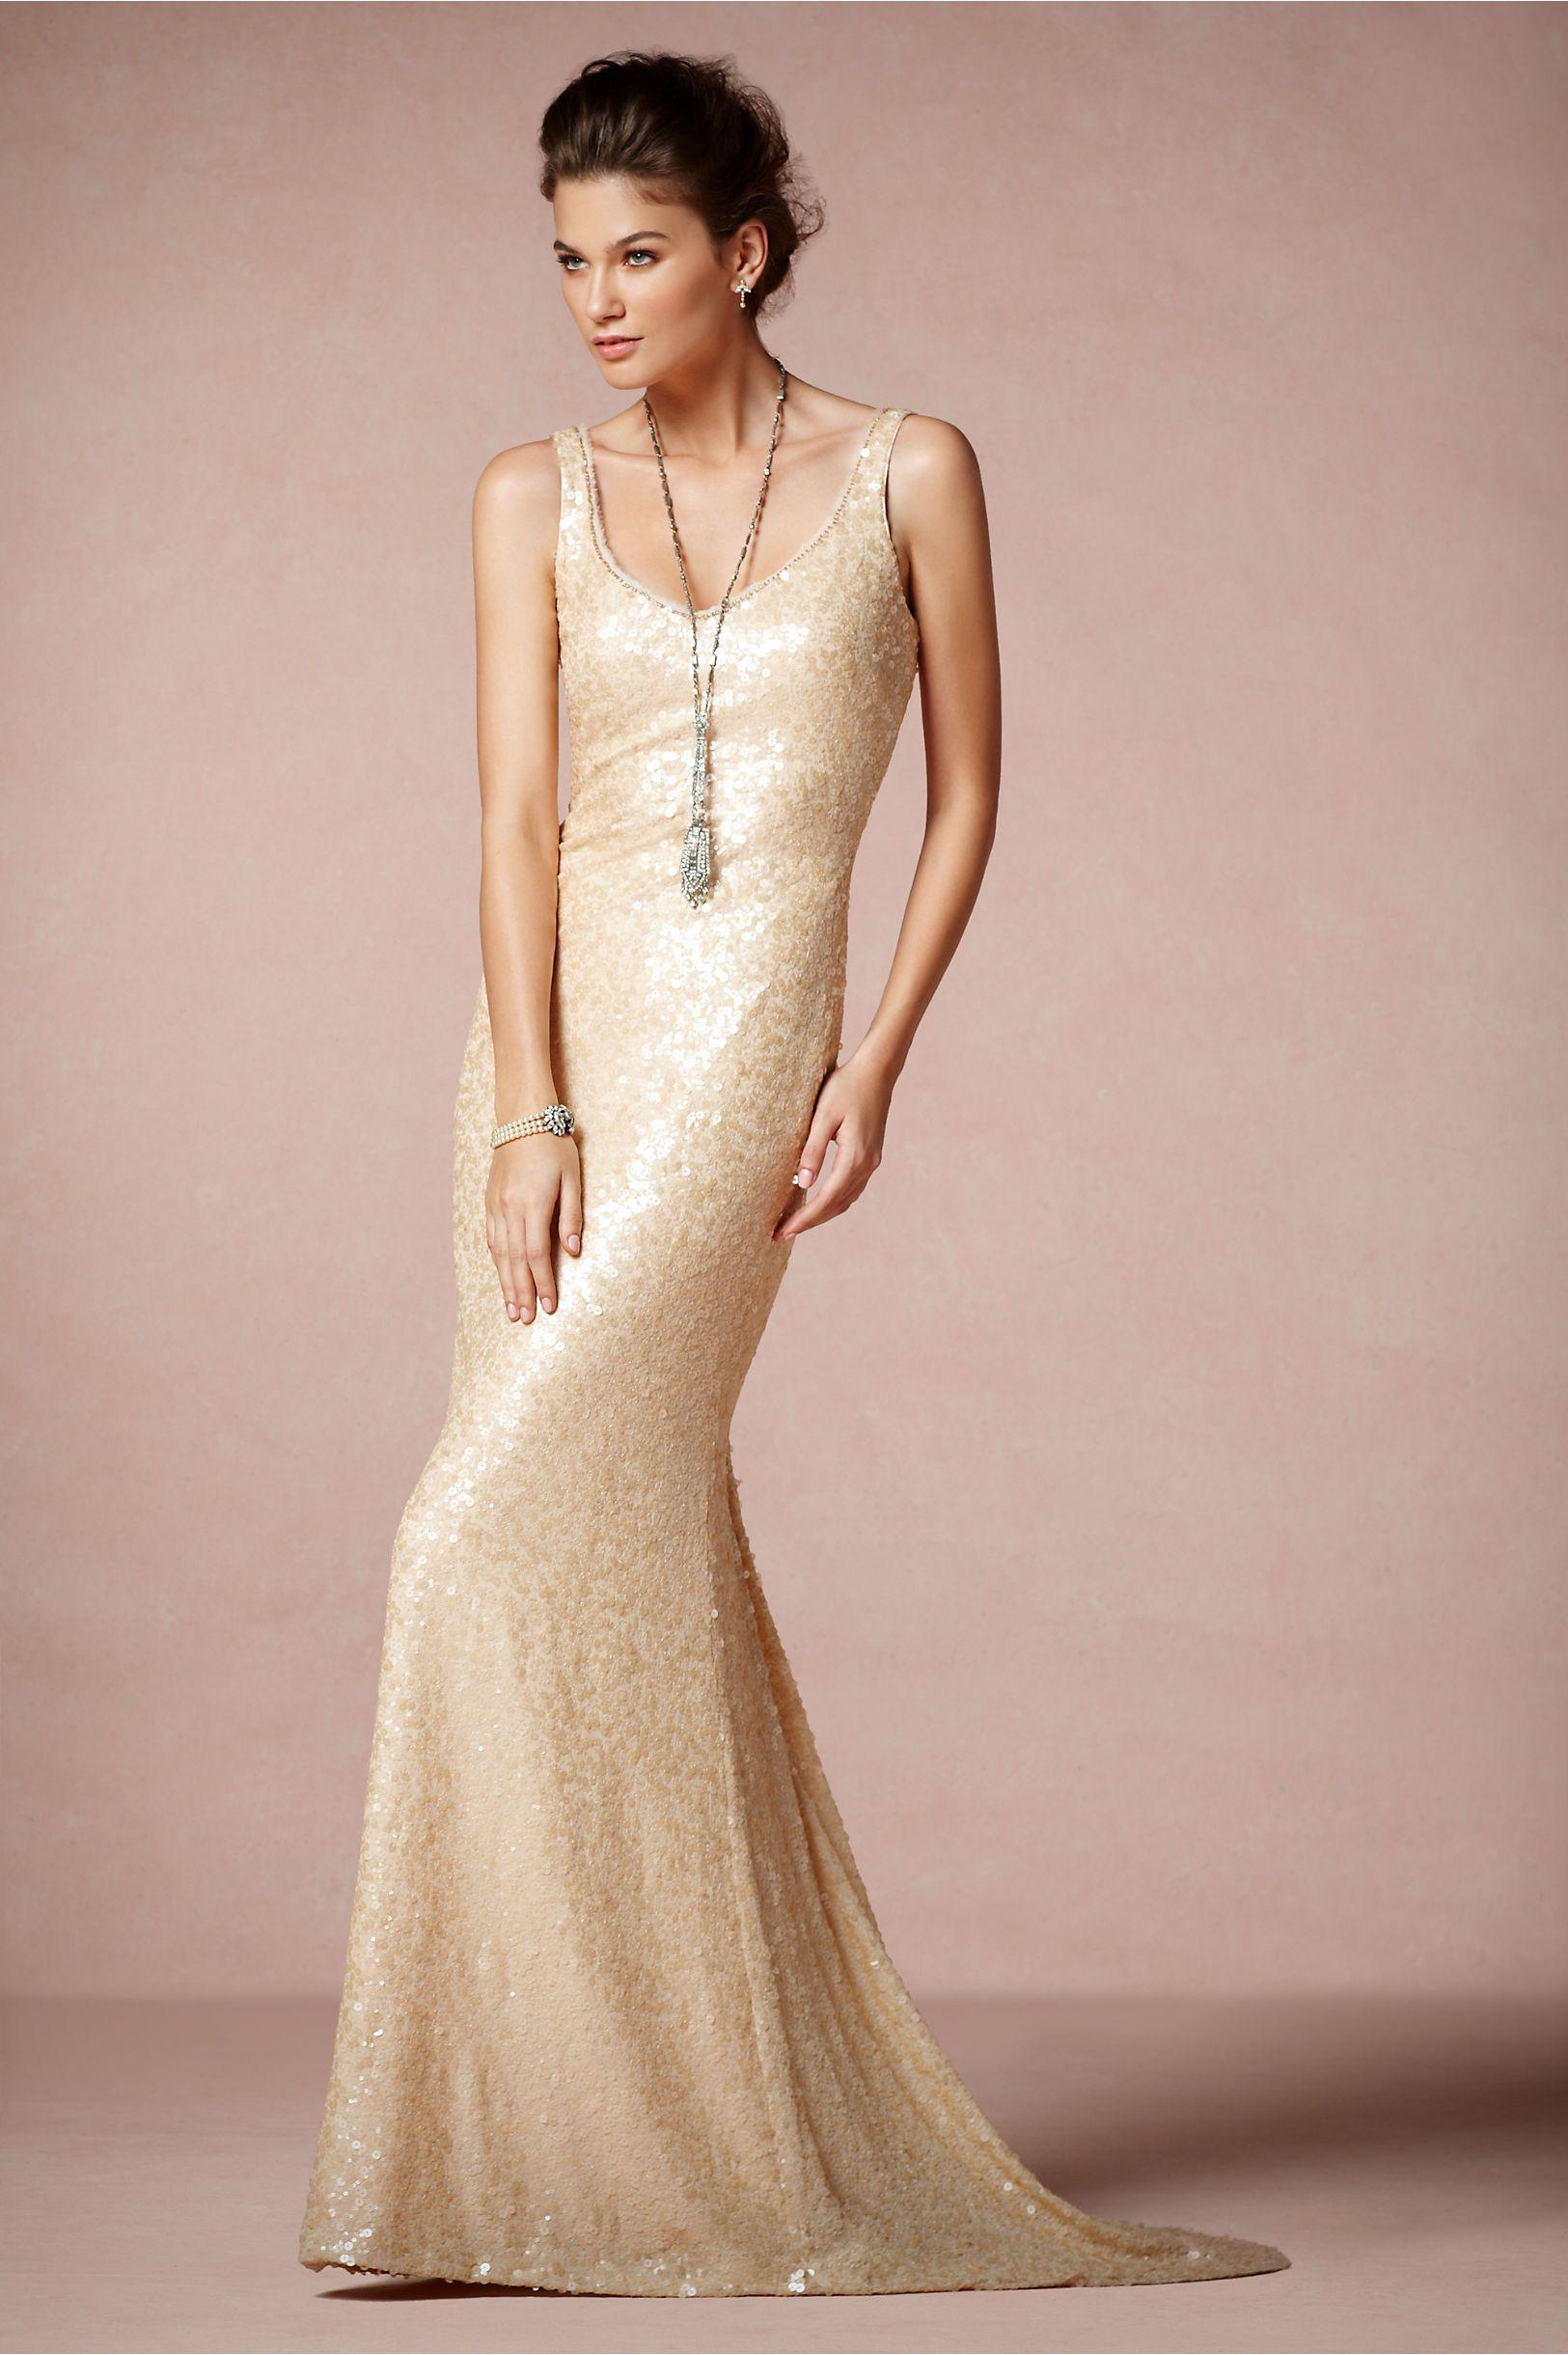 Champagne Wedding Dress For Elegance And Sweet Look Inspiring Mode Tank Vera Wang [ 2440 x 1625 Pixel ]